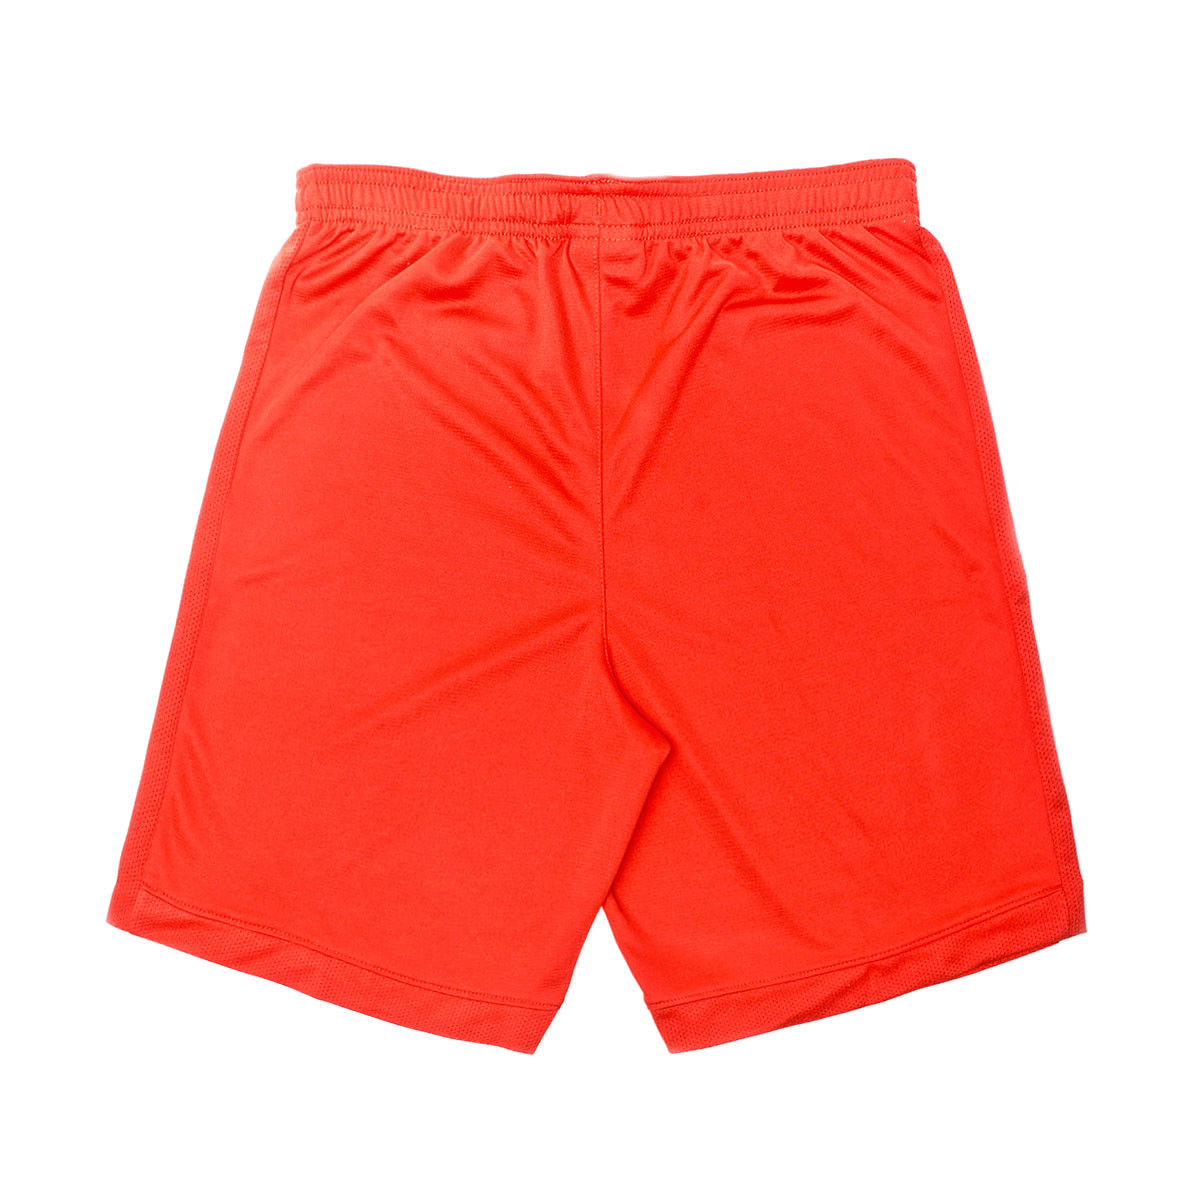 Nike Kids Dri FIT Academy Shorts